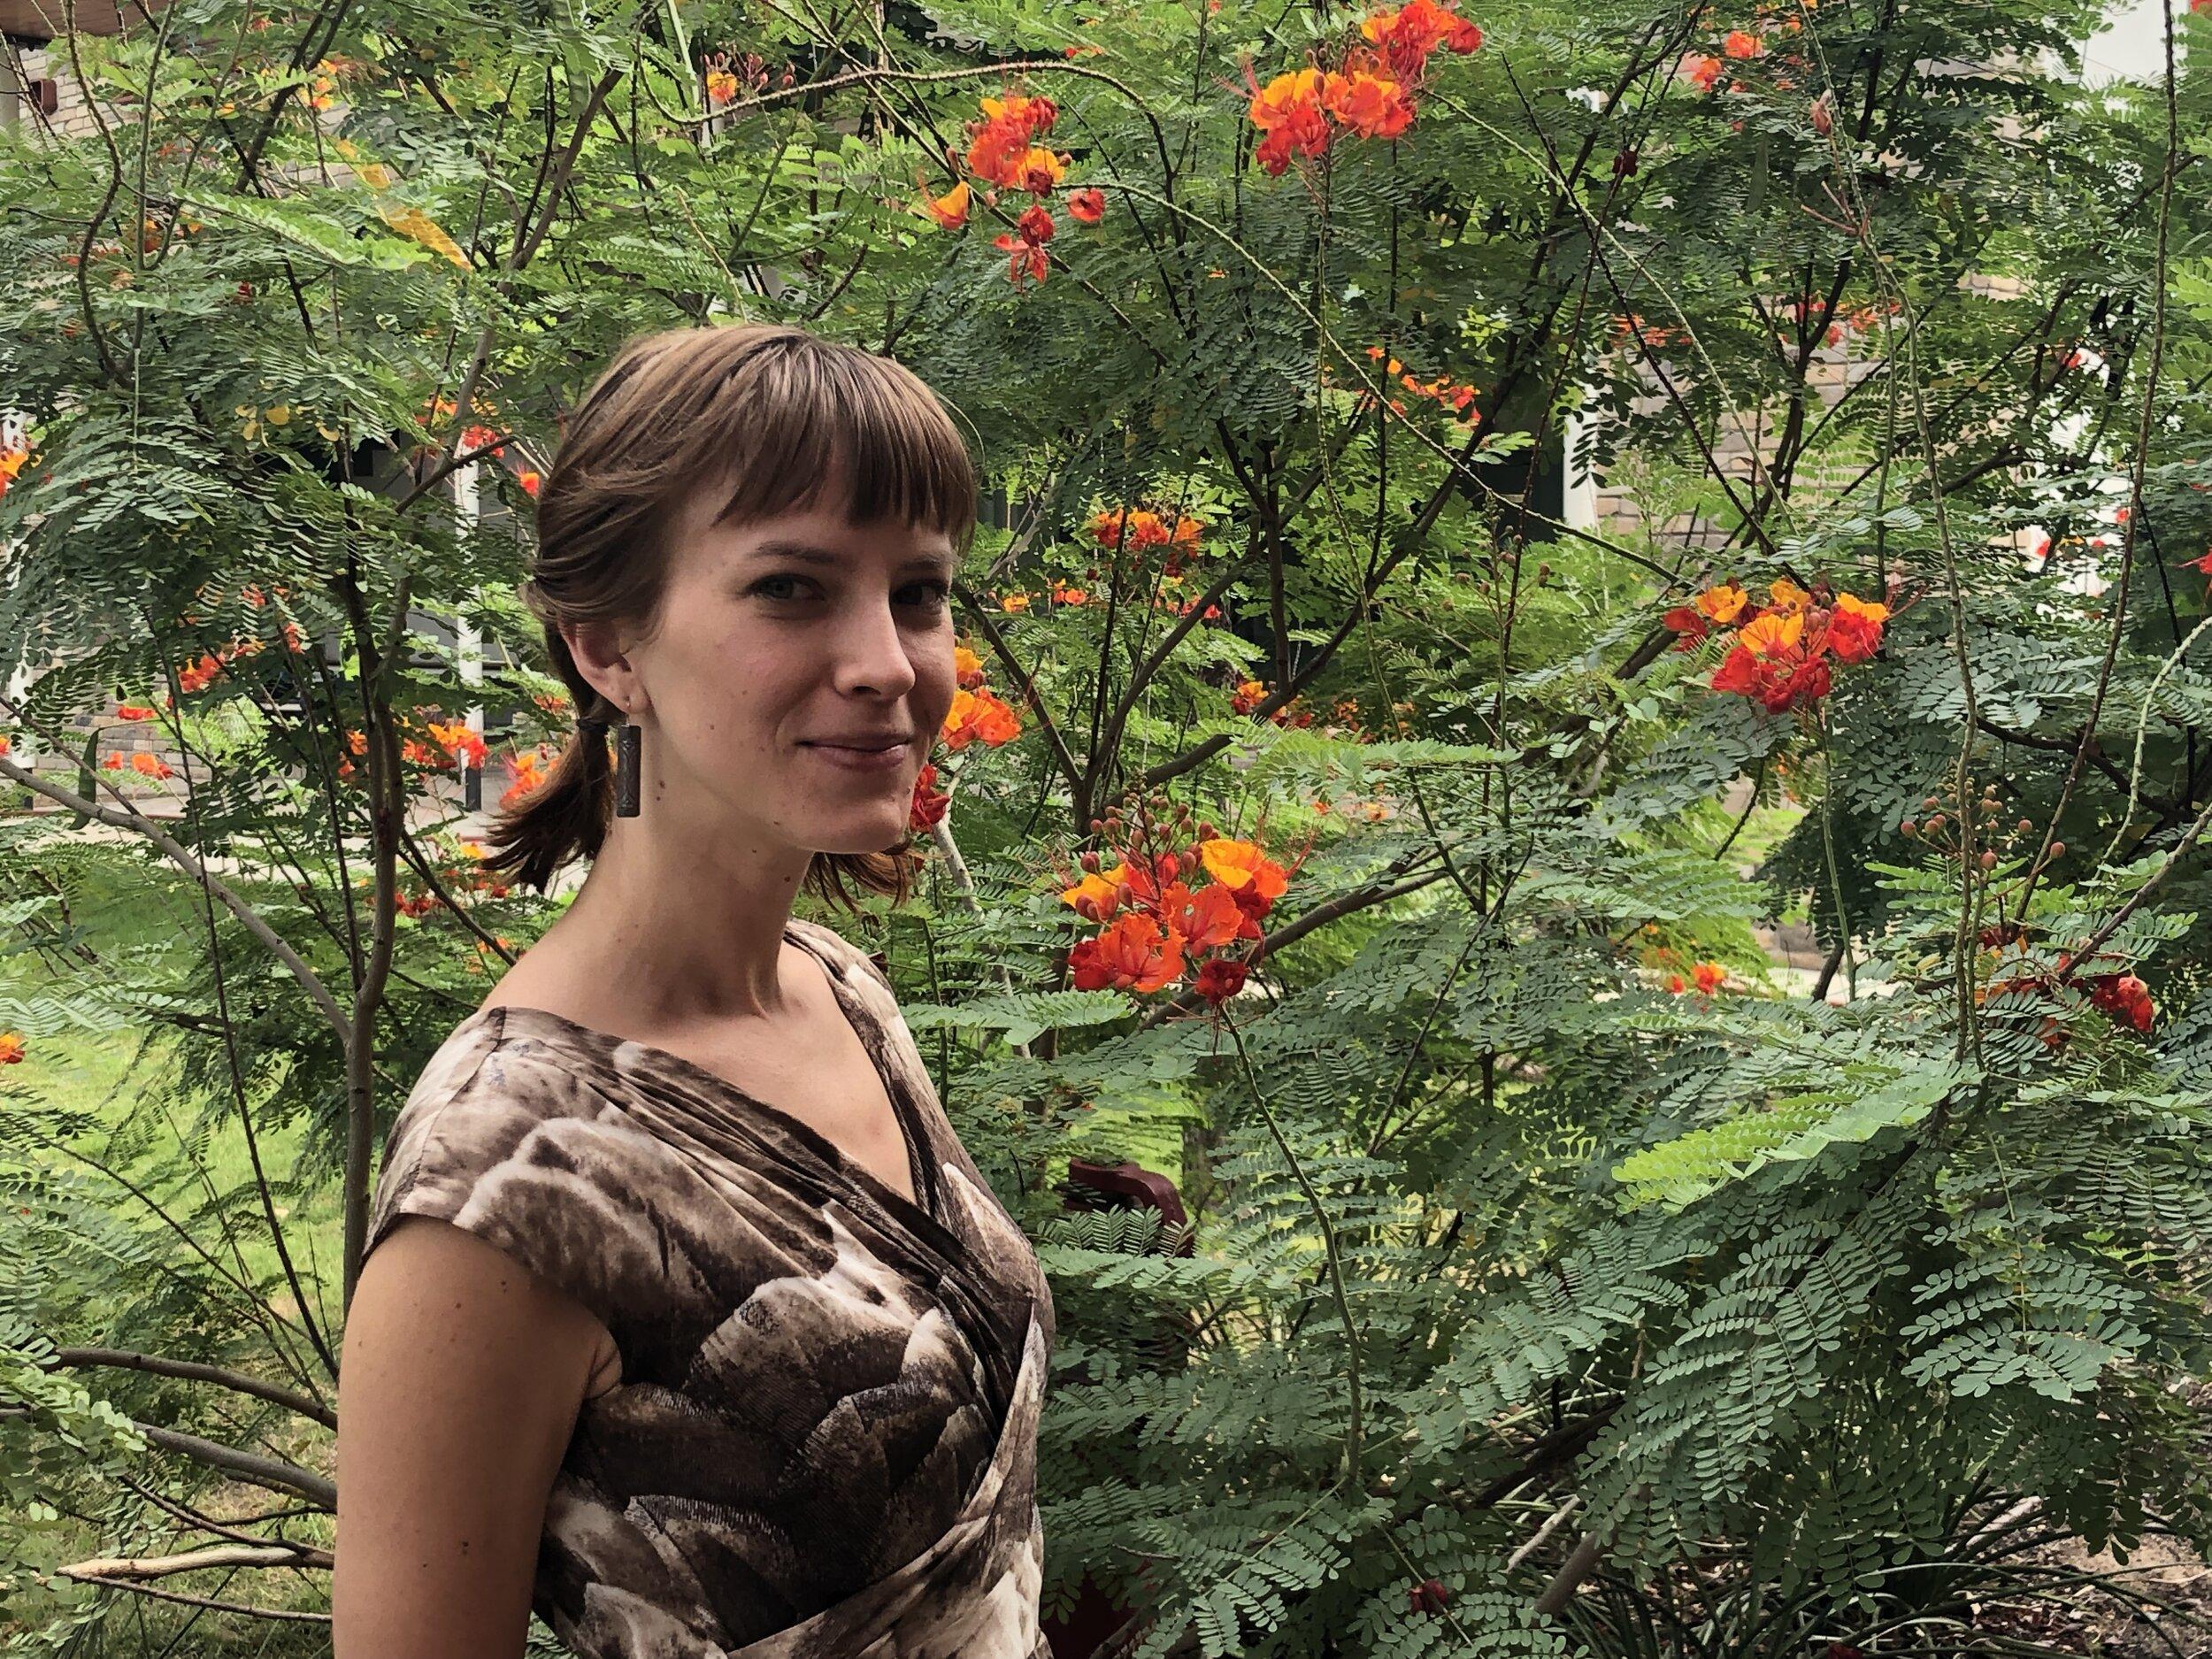 Sofia, Cider Spoon's Fall 2019 Intern